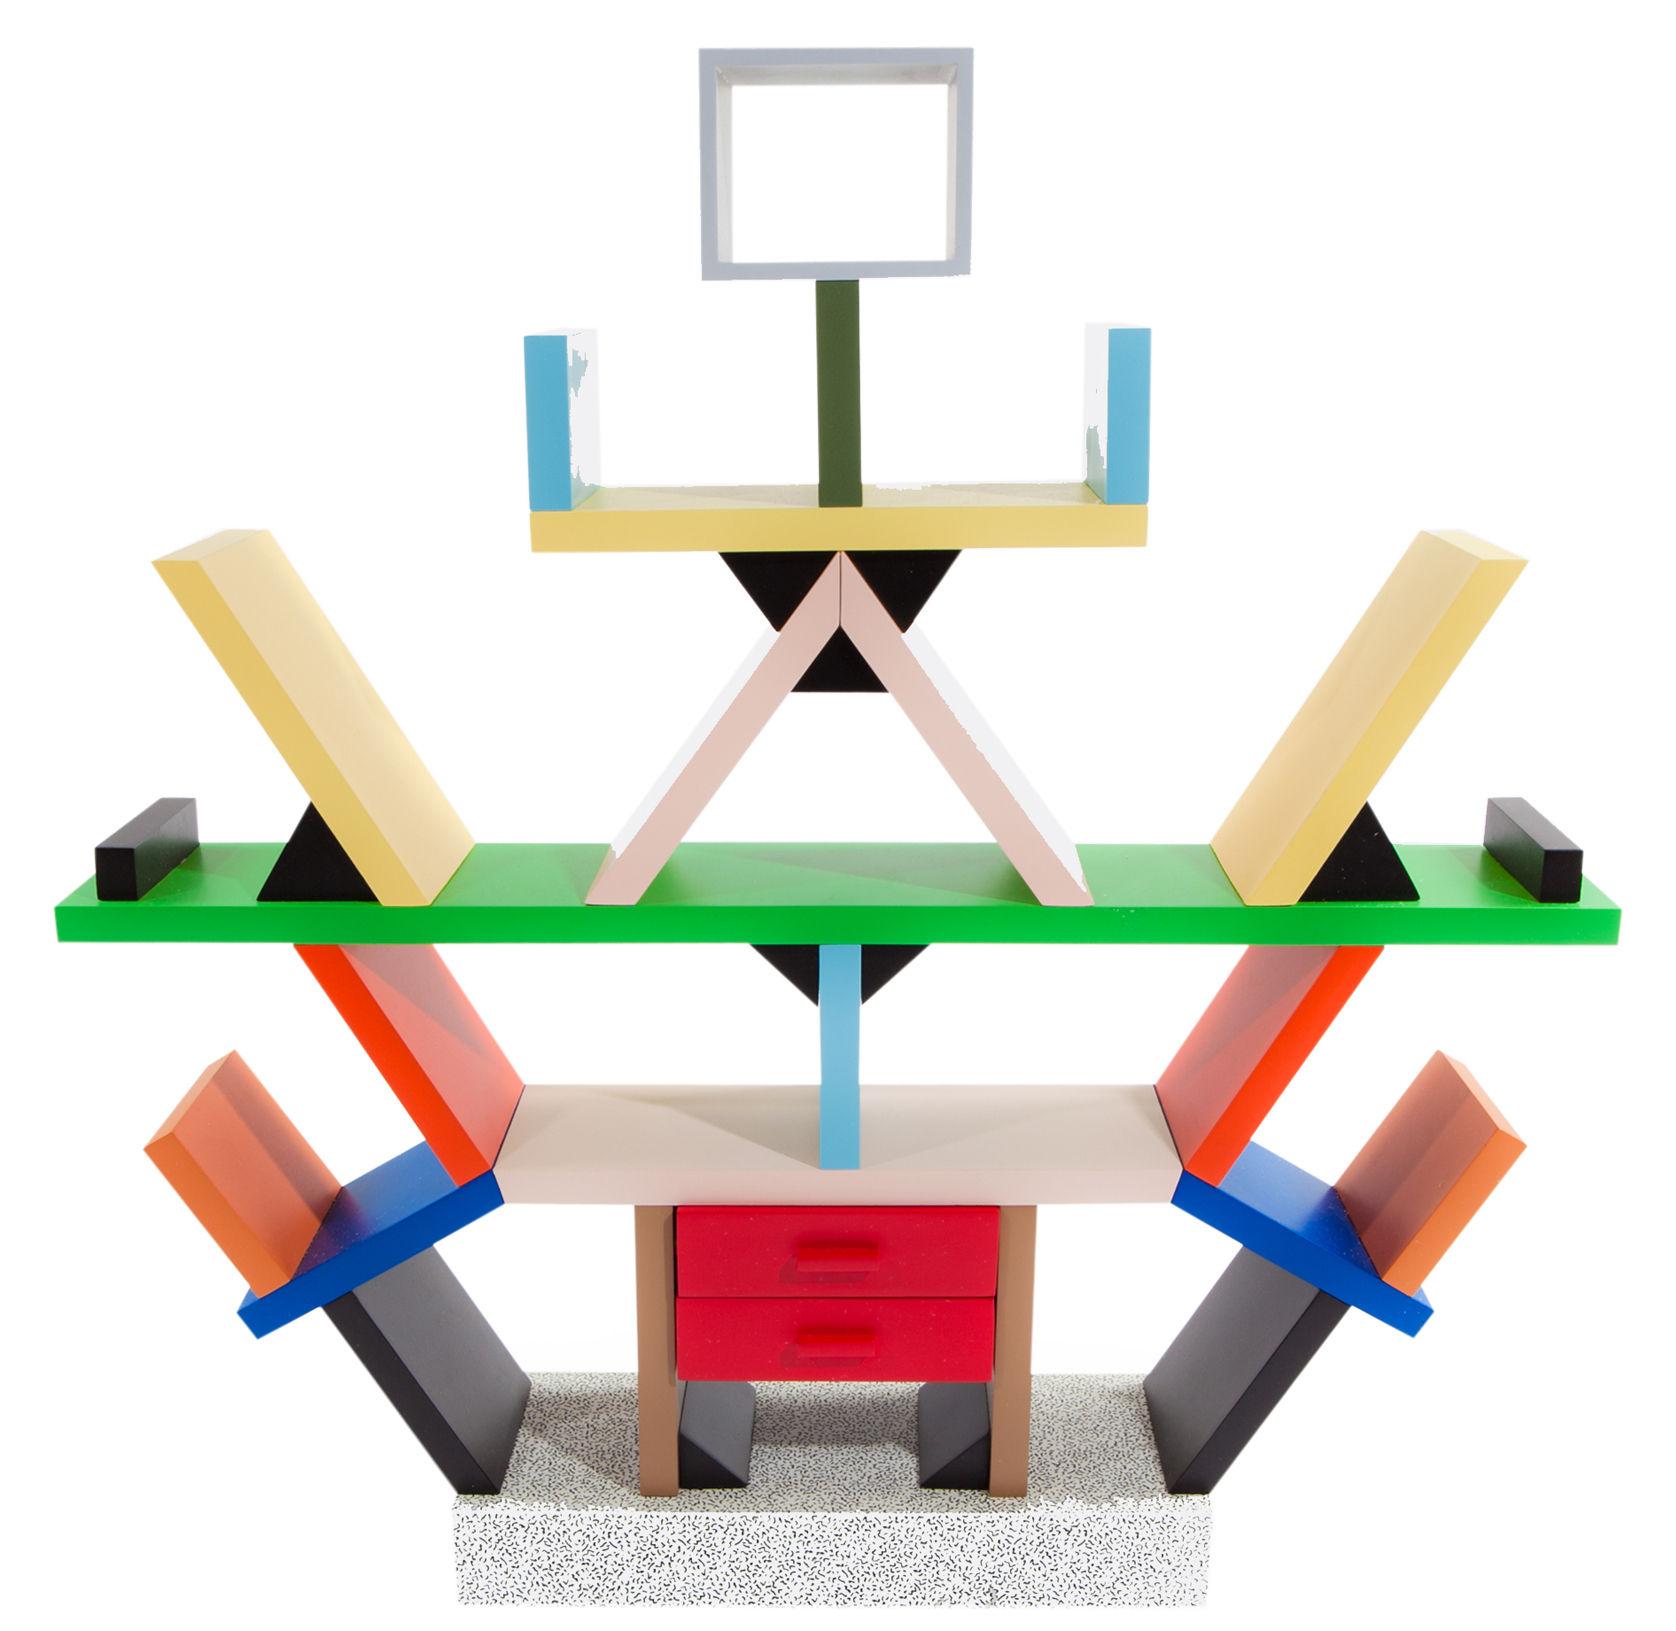 Möbel - Regale und Bücherregale - Carlton Bücherregal von Ettore Sottsass / Raumtrenner / 1981 - Memphis Milano - Mehrfarbig - lackiertes Holz, Laminé plastique